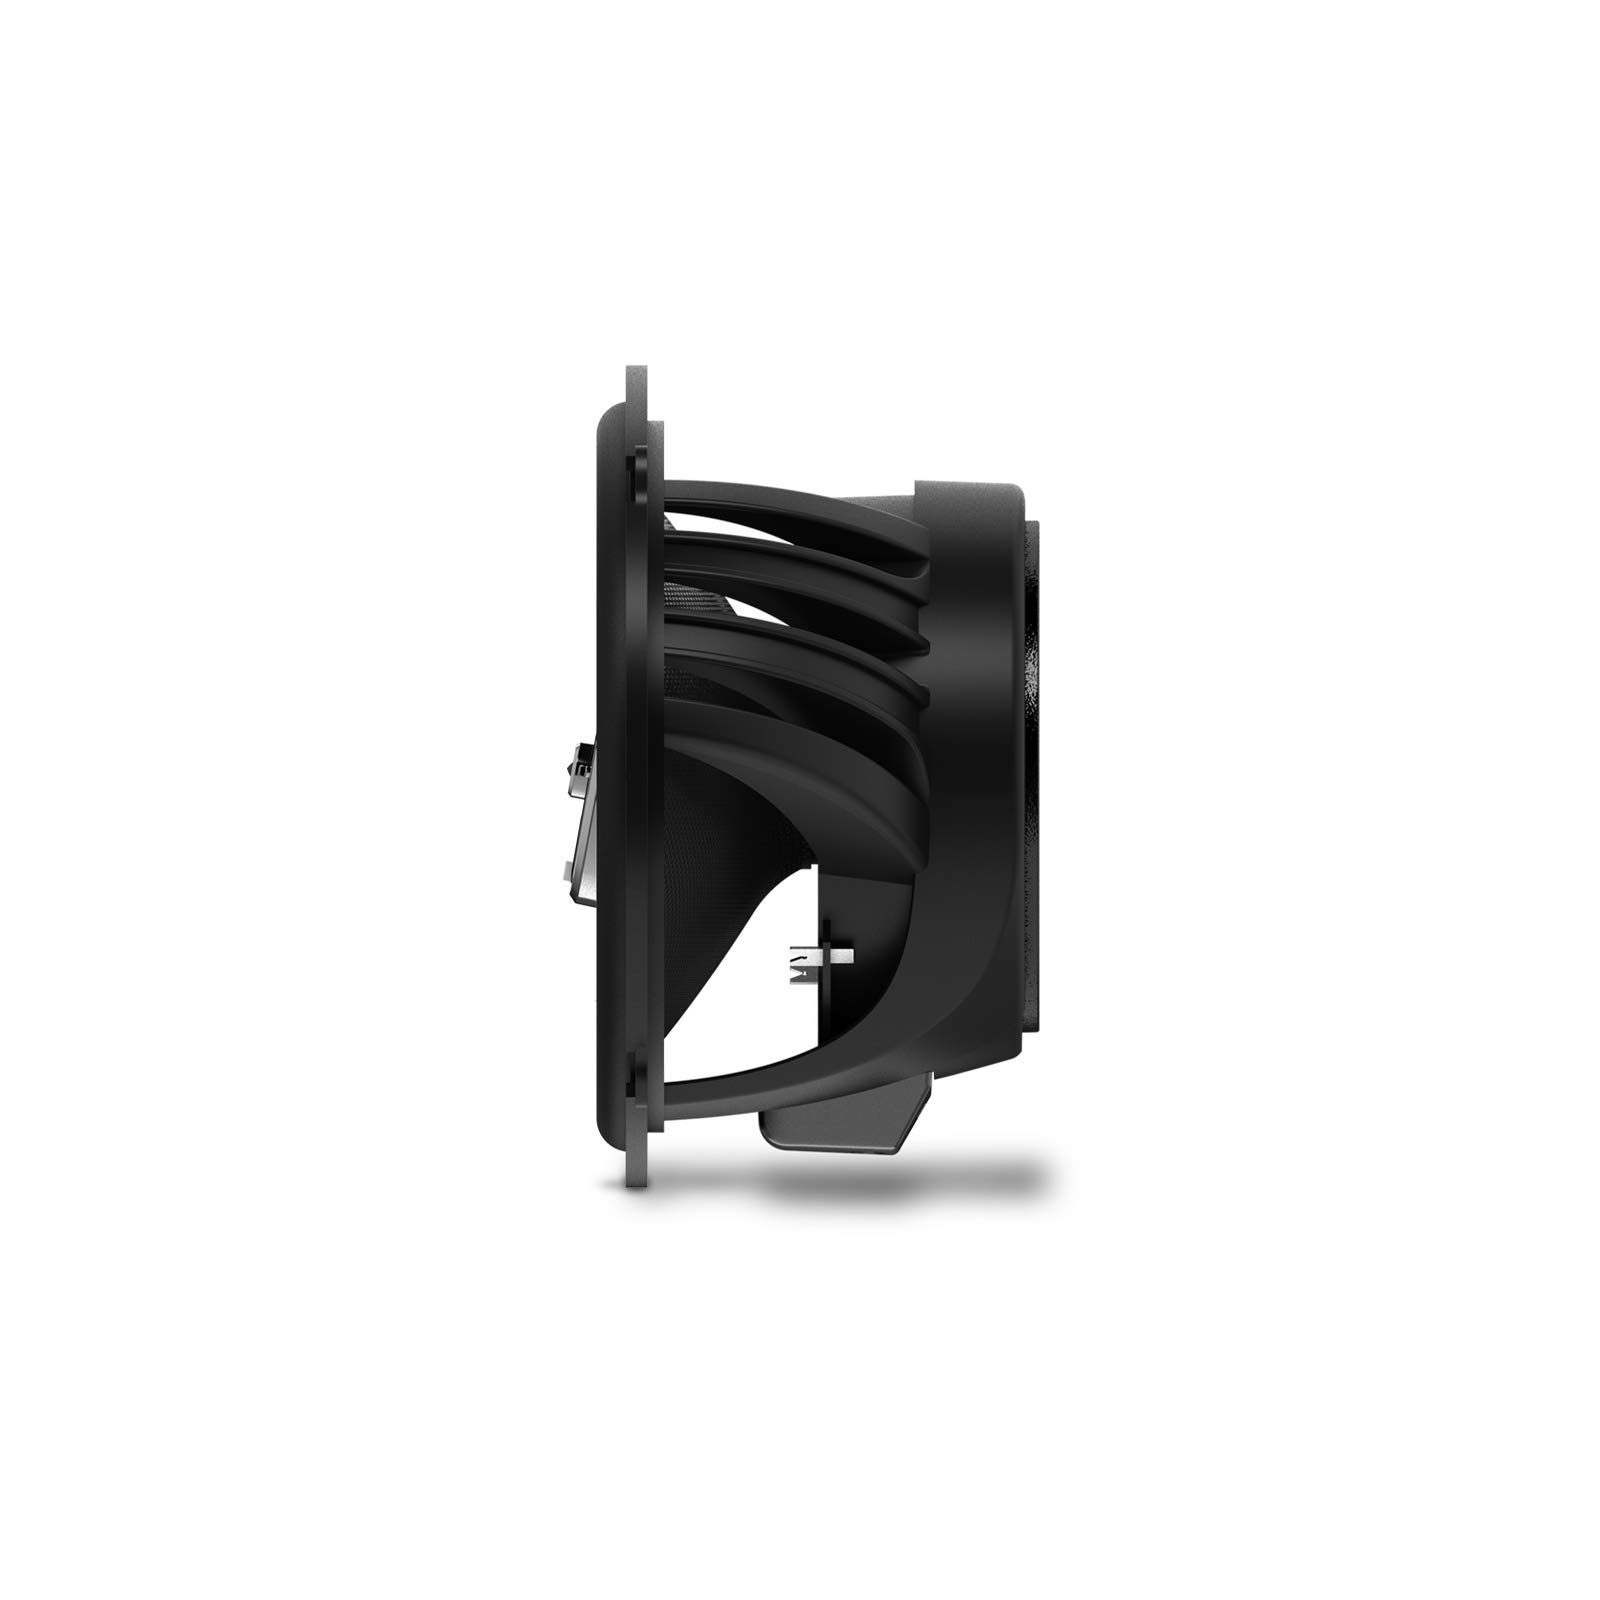 Infinity KAPPA-93iX 6'' x 9'' Three-way Car Audio Multi Element Speaker by Infinity